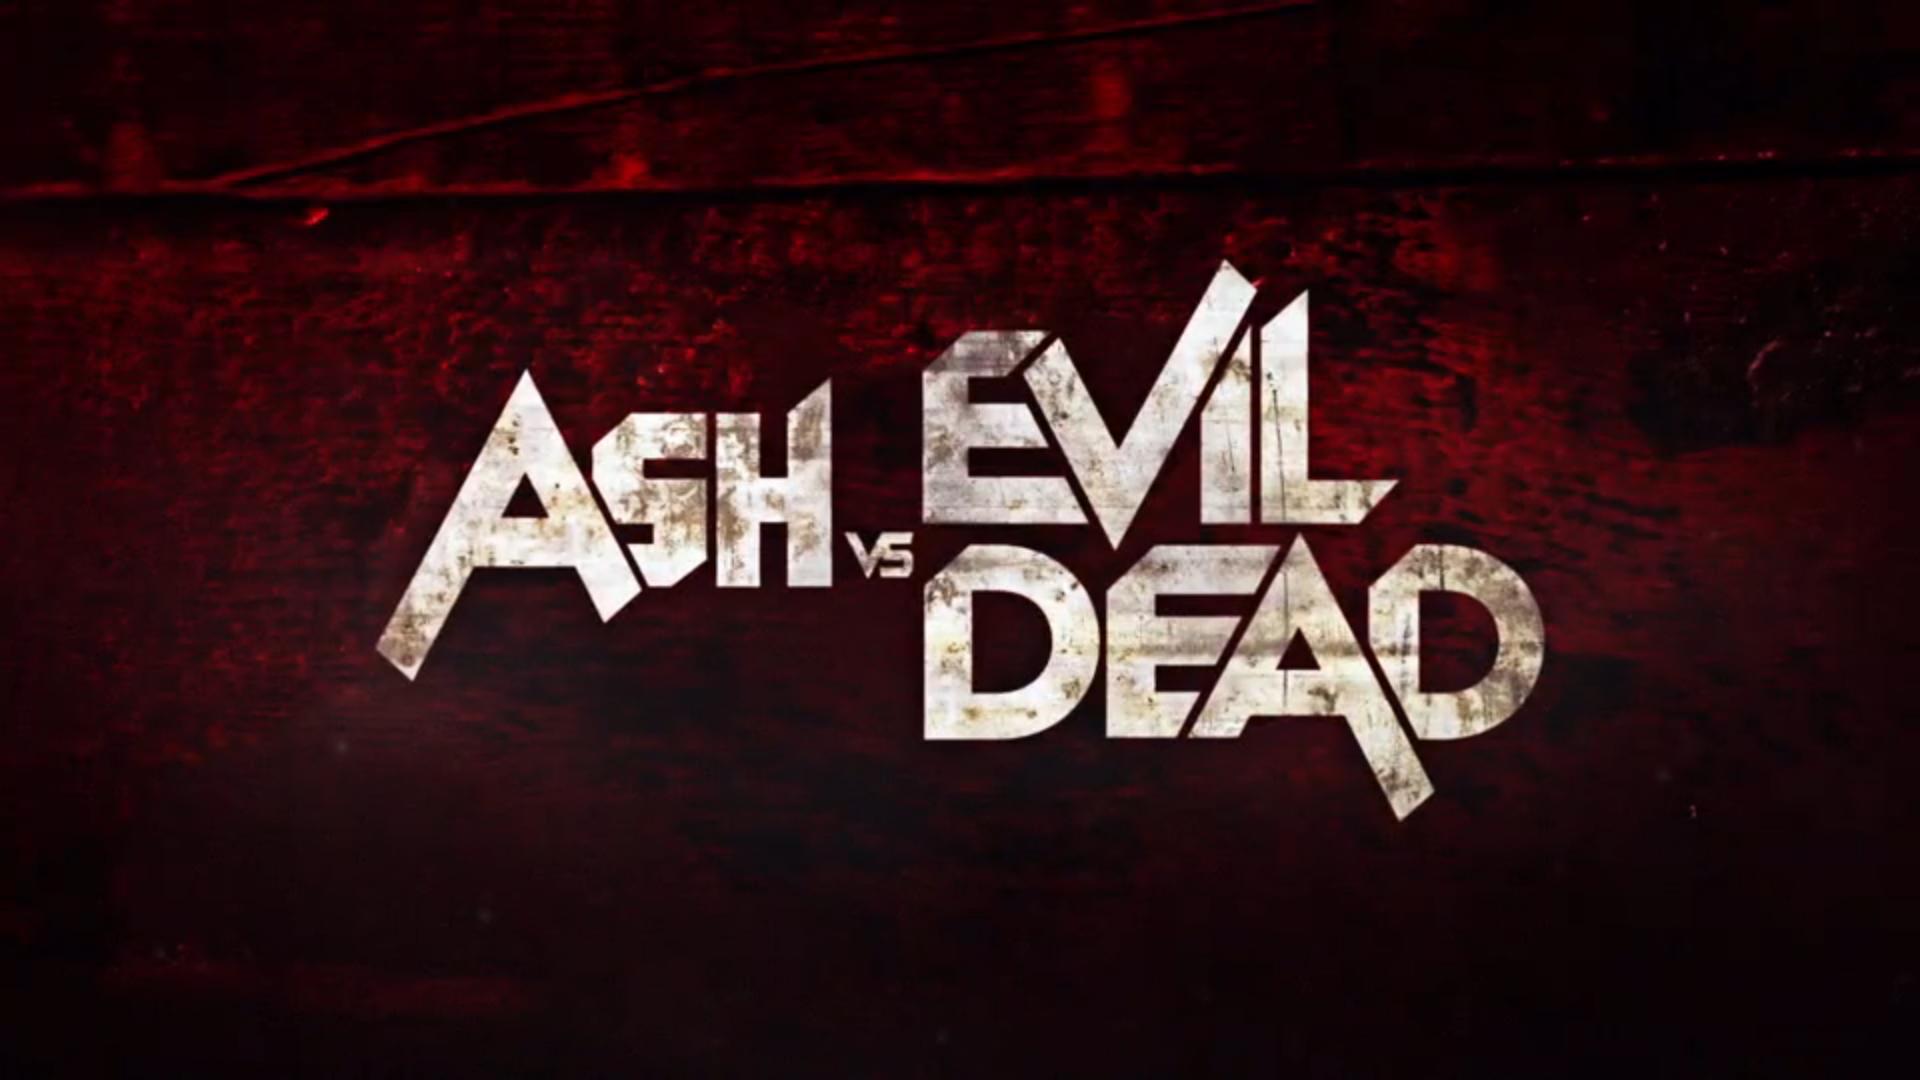 Ash Vs Evil Dead Ash Vs Evil Dead Wallpaper 40808685 Fanpop